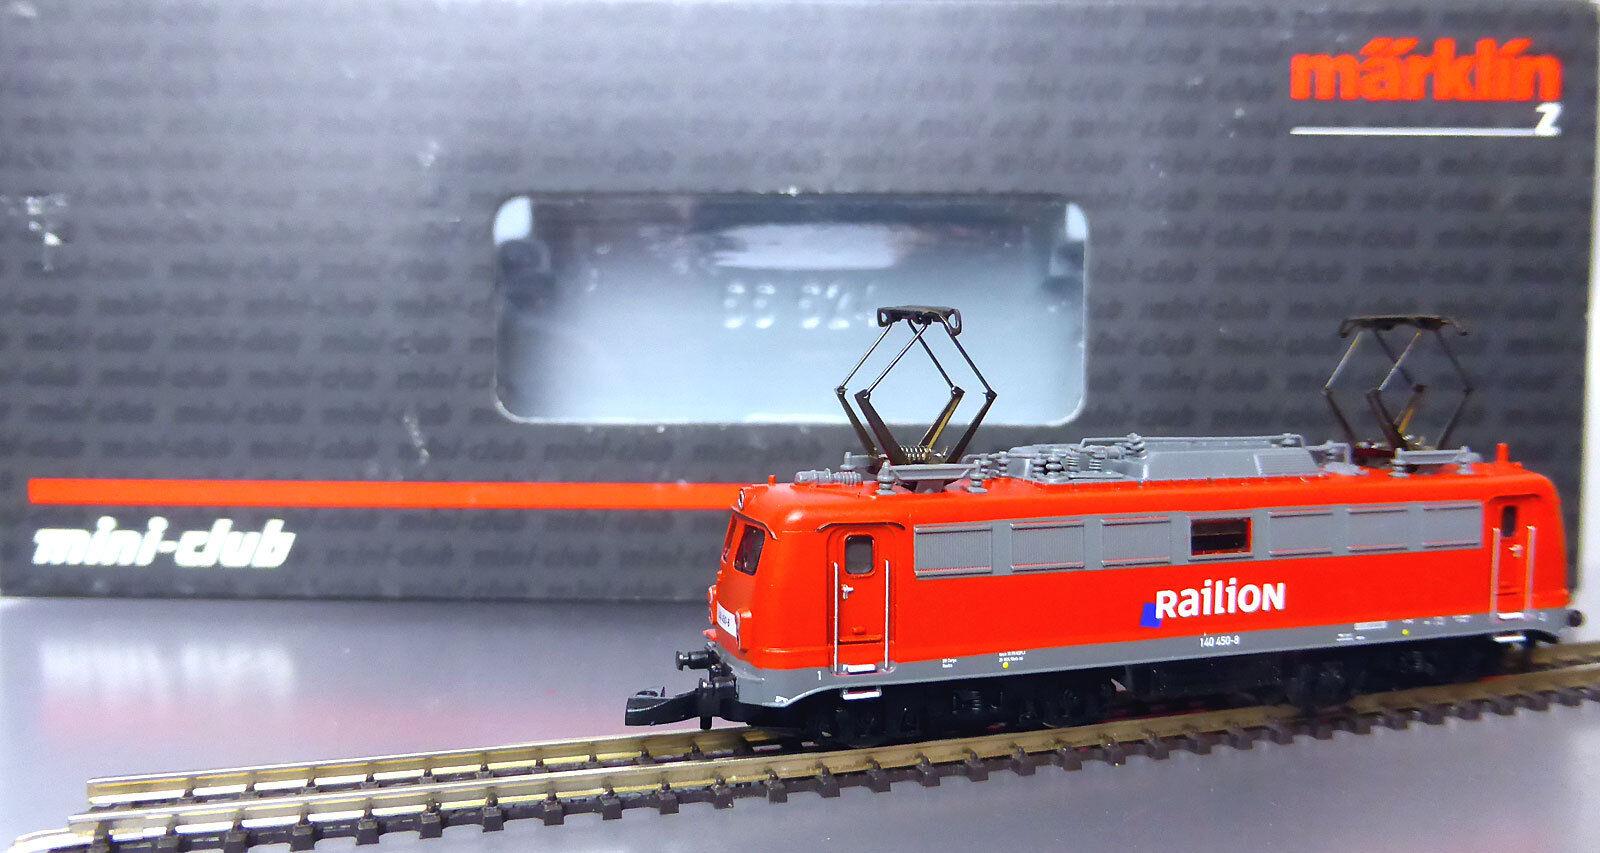 Z miniclub 88392; ELLOK 140 450-8 Railion, verkehrsrot, in scatola originale/d230